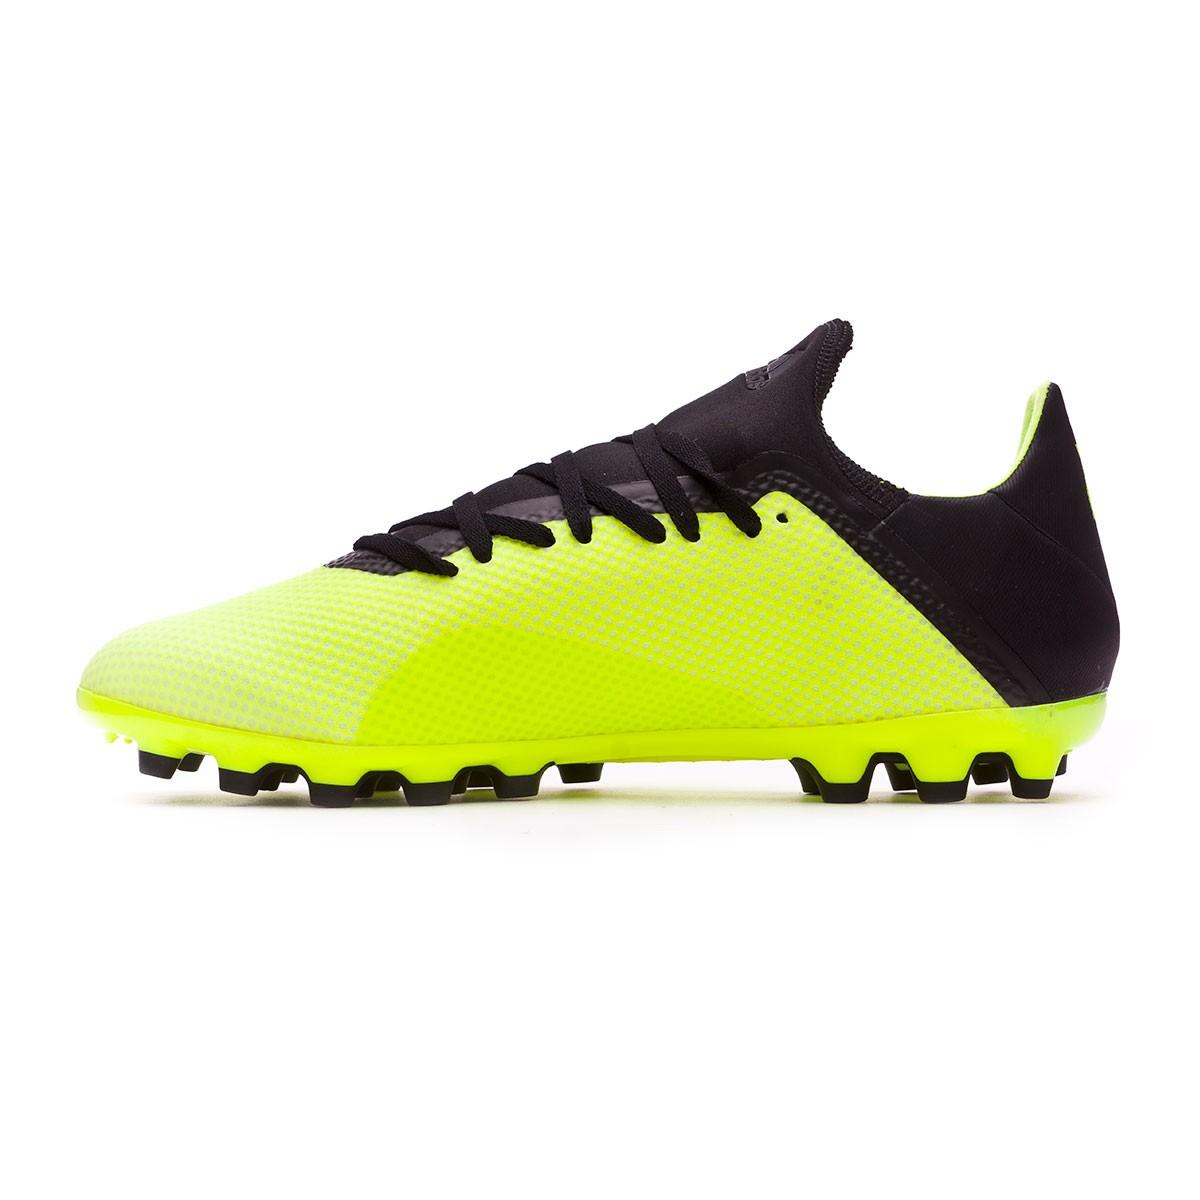 Fútbol X 18 Adidas De Yellow Core 3 Ag White Black Solar Zapatos CBoEQdeWrx